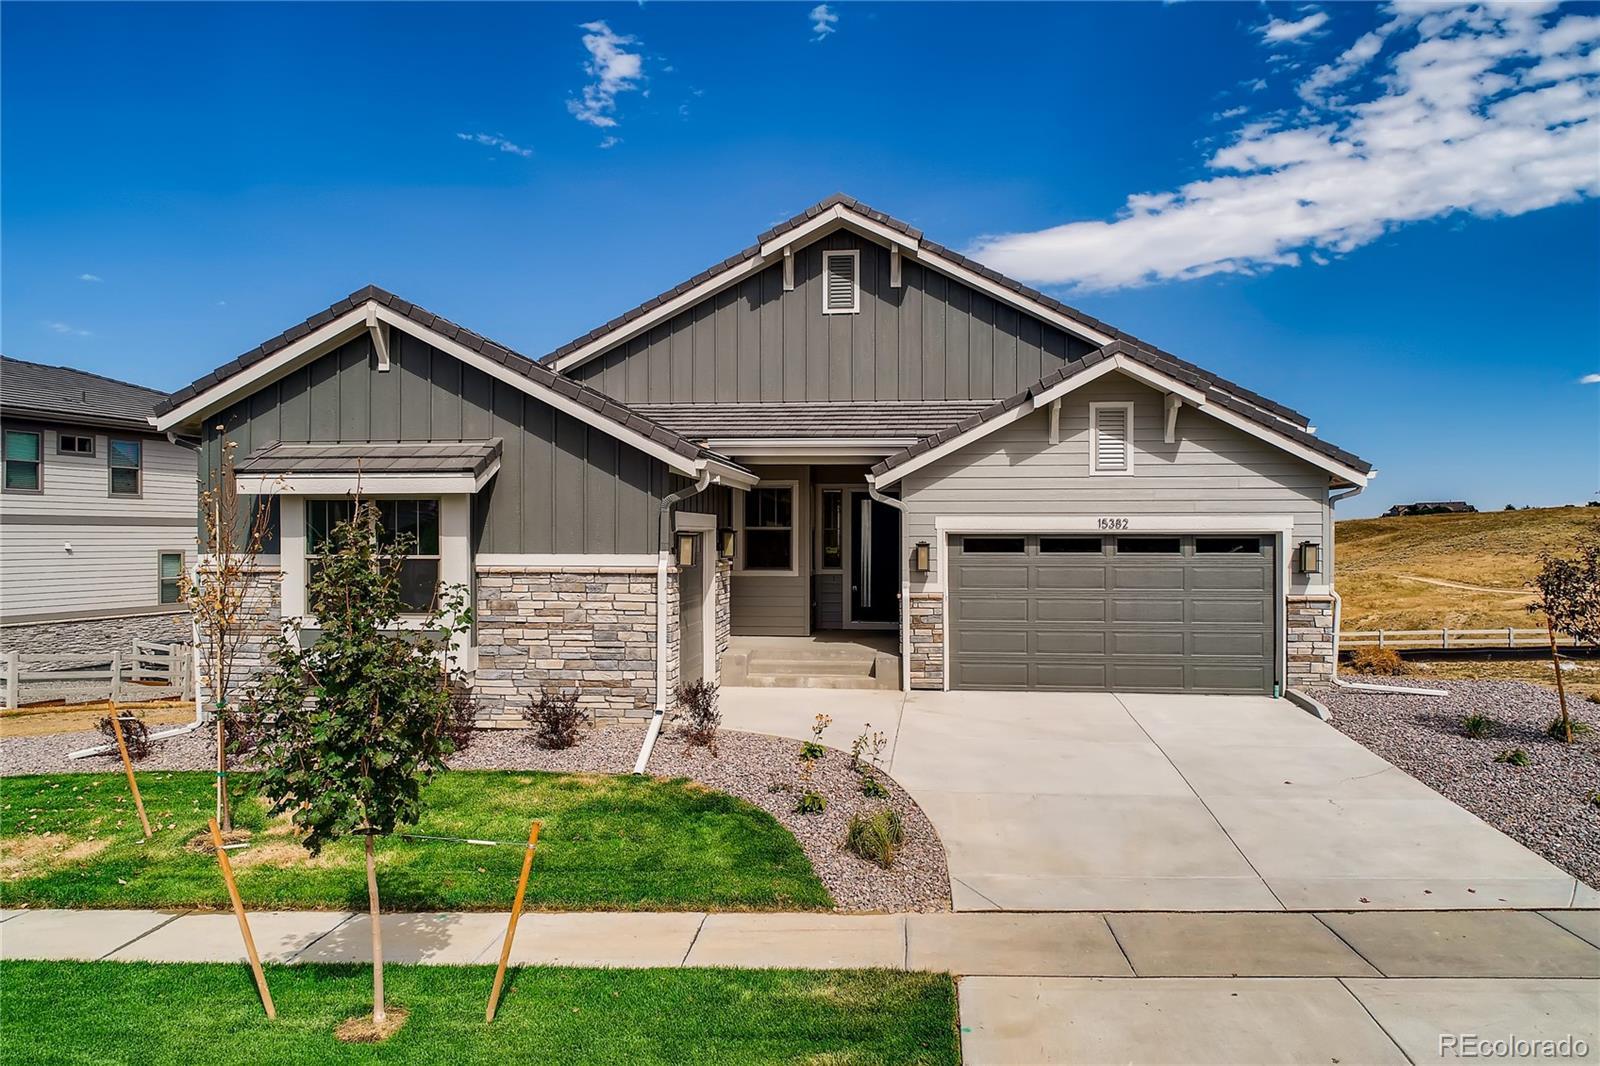 15382 Irving, Broomfield, CO